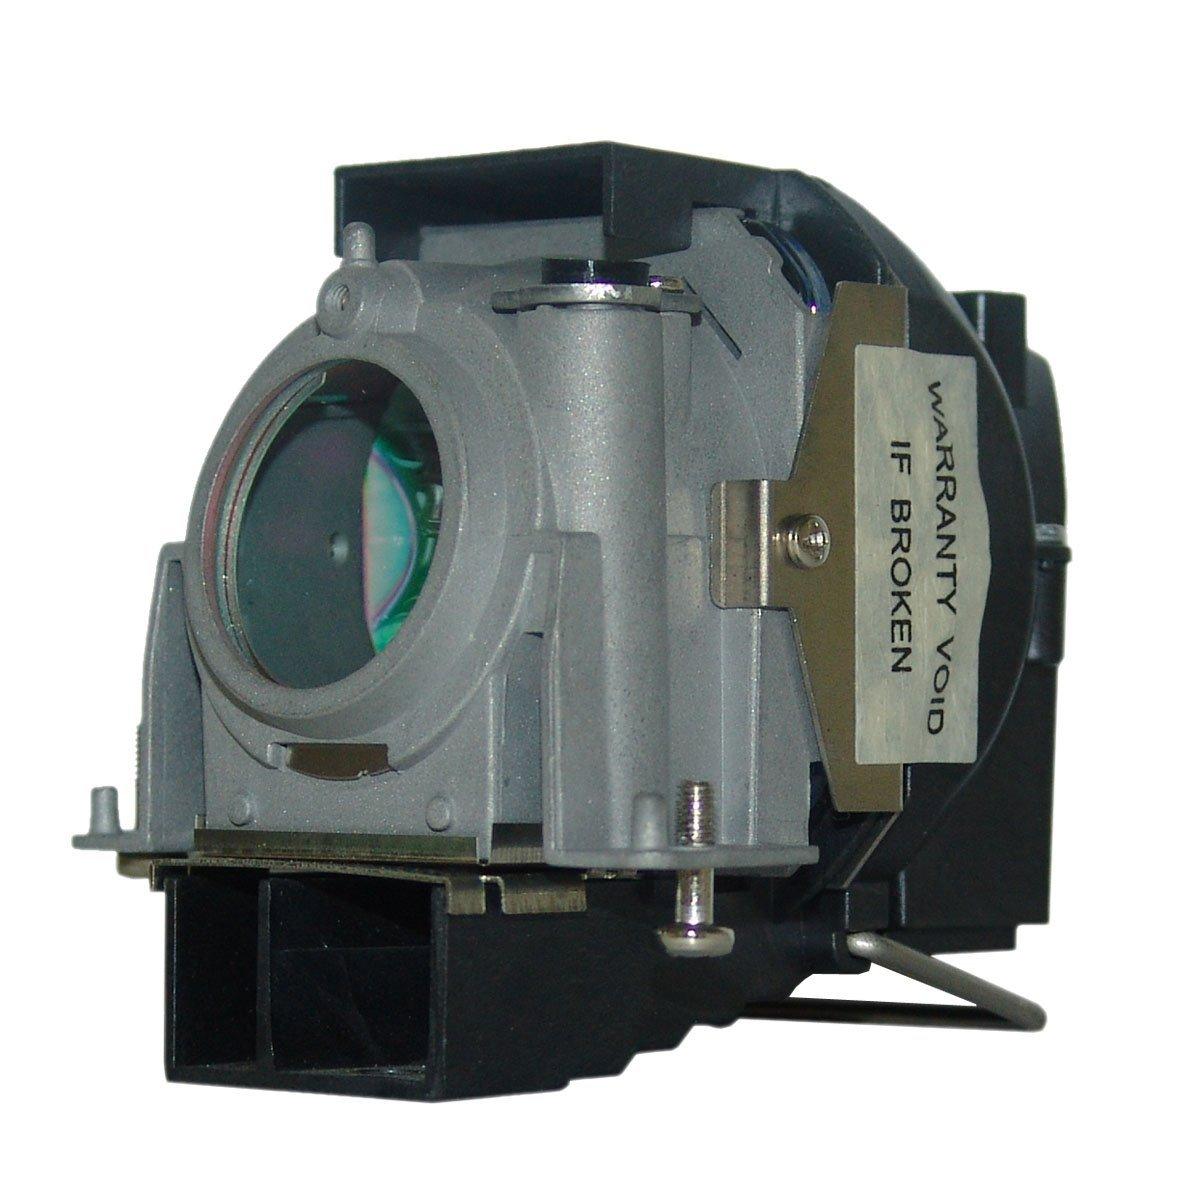 все цены на Projector Lamp Bulb NP08LP NP-08LP for NEC NP41 NP52 NP43 NP43G NP54 with housing онлайн